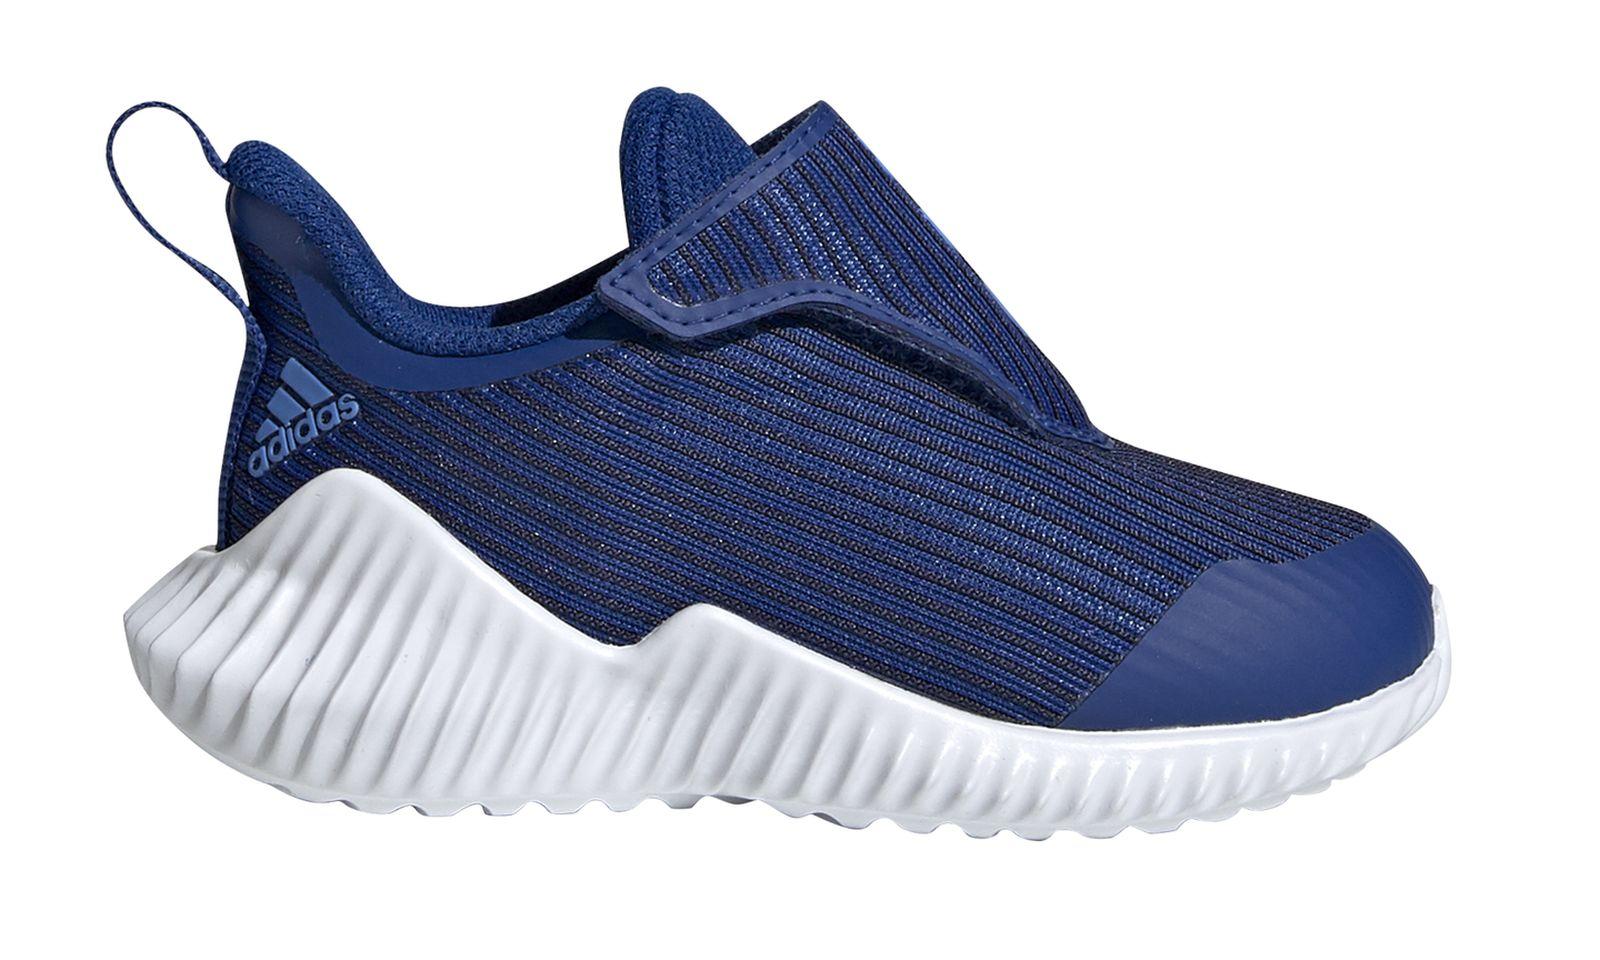 sur Bas Chaussures Détails en Âge Blanc I Enfant AC Performance Fortarun Loisirs Adidas Bleu 80wkPOnXN